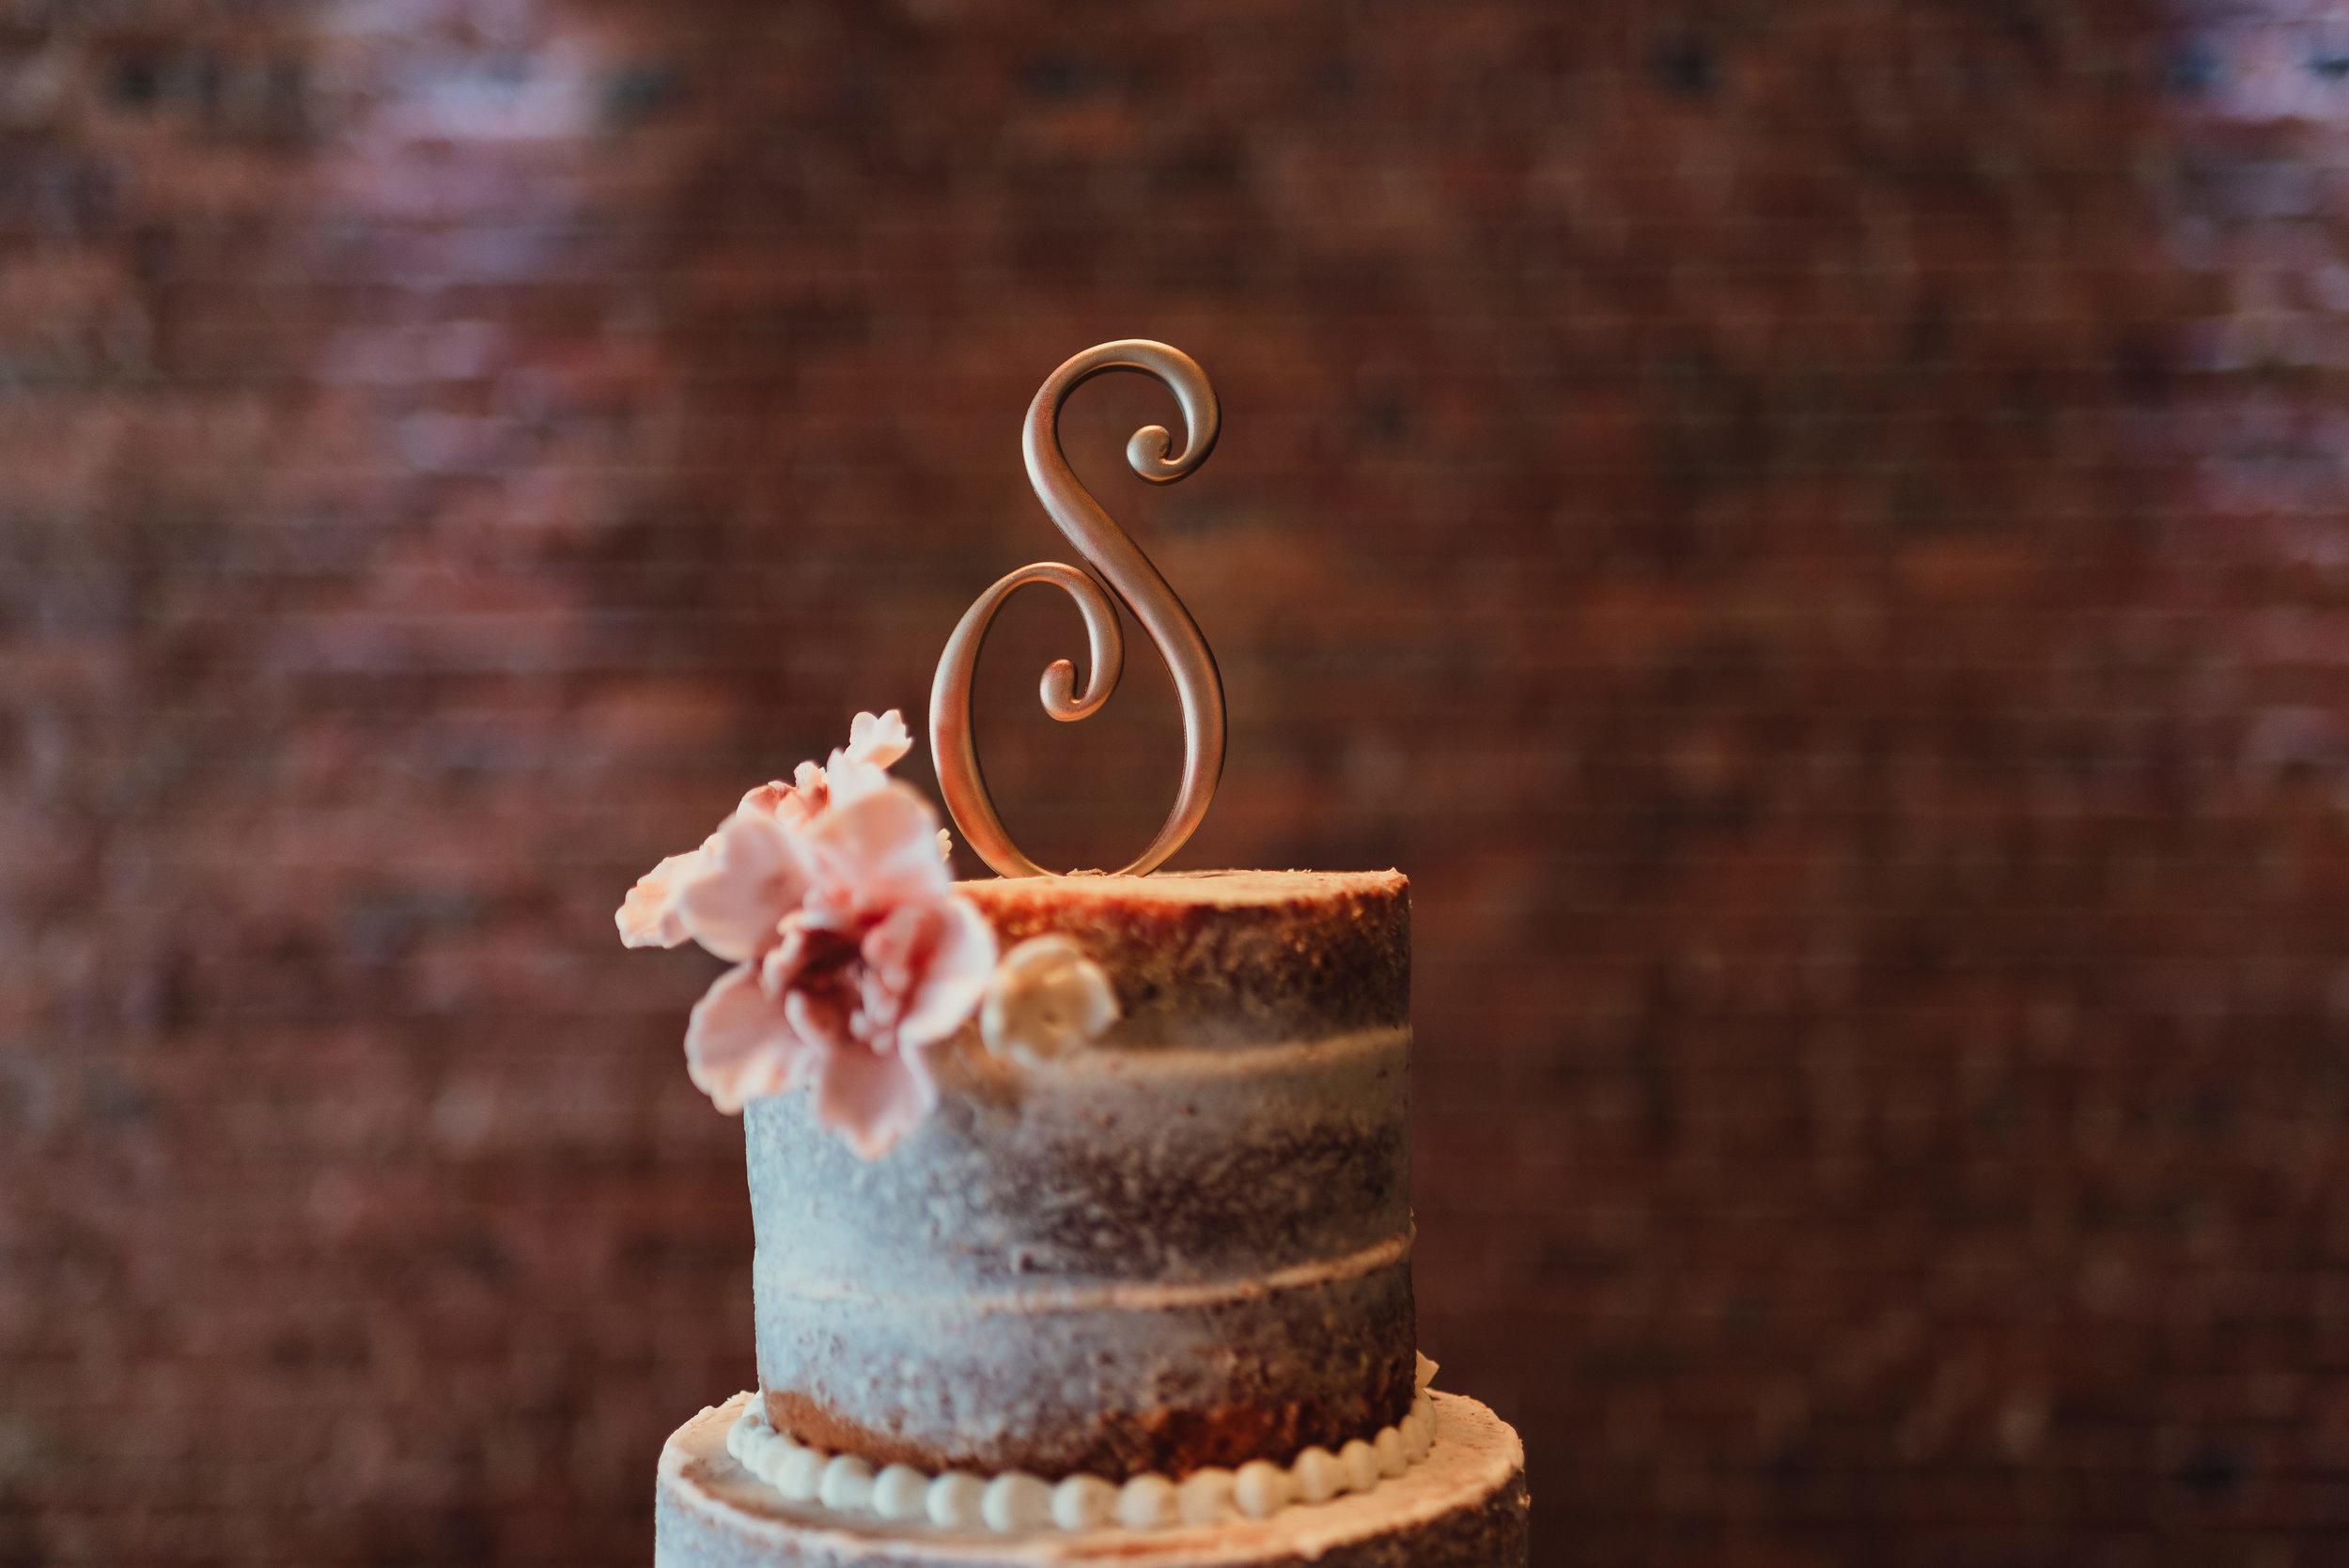 east-tn-wedding-photographer-tennessee-elopement-photographer-kingsport-tn-wedding-photographer (70 of 1001).jpg